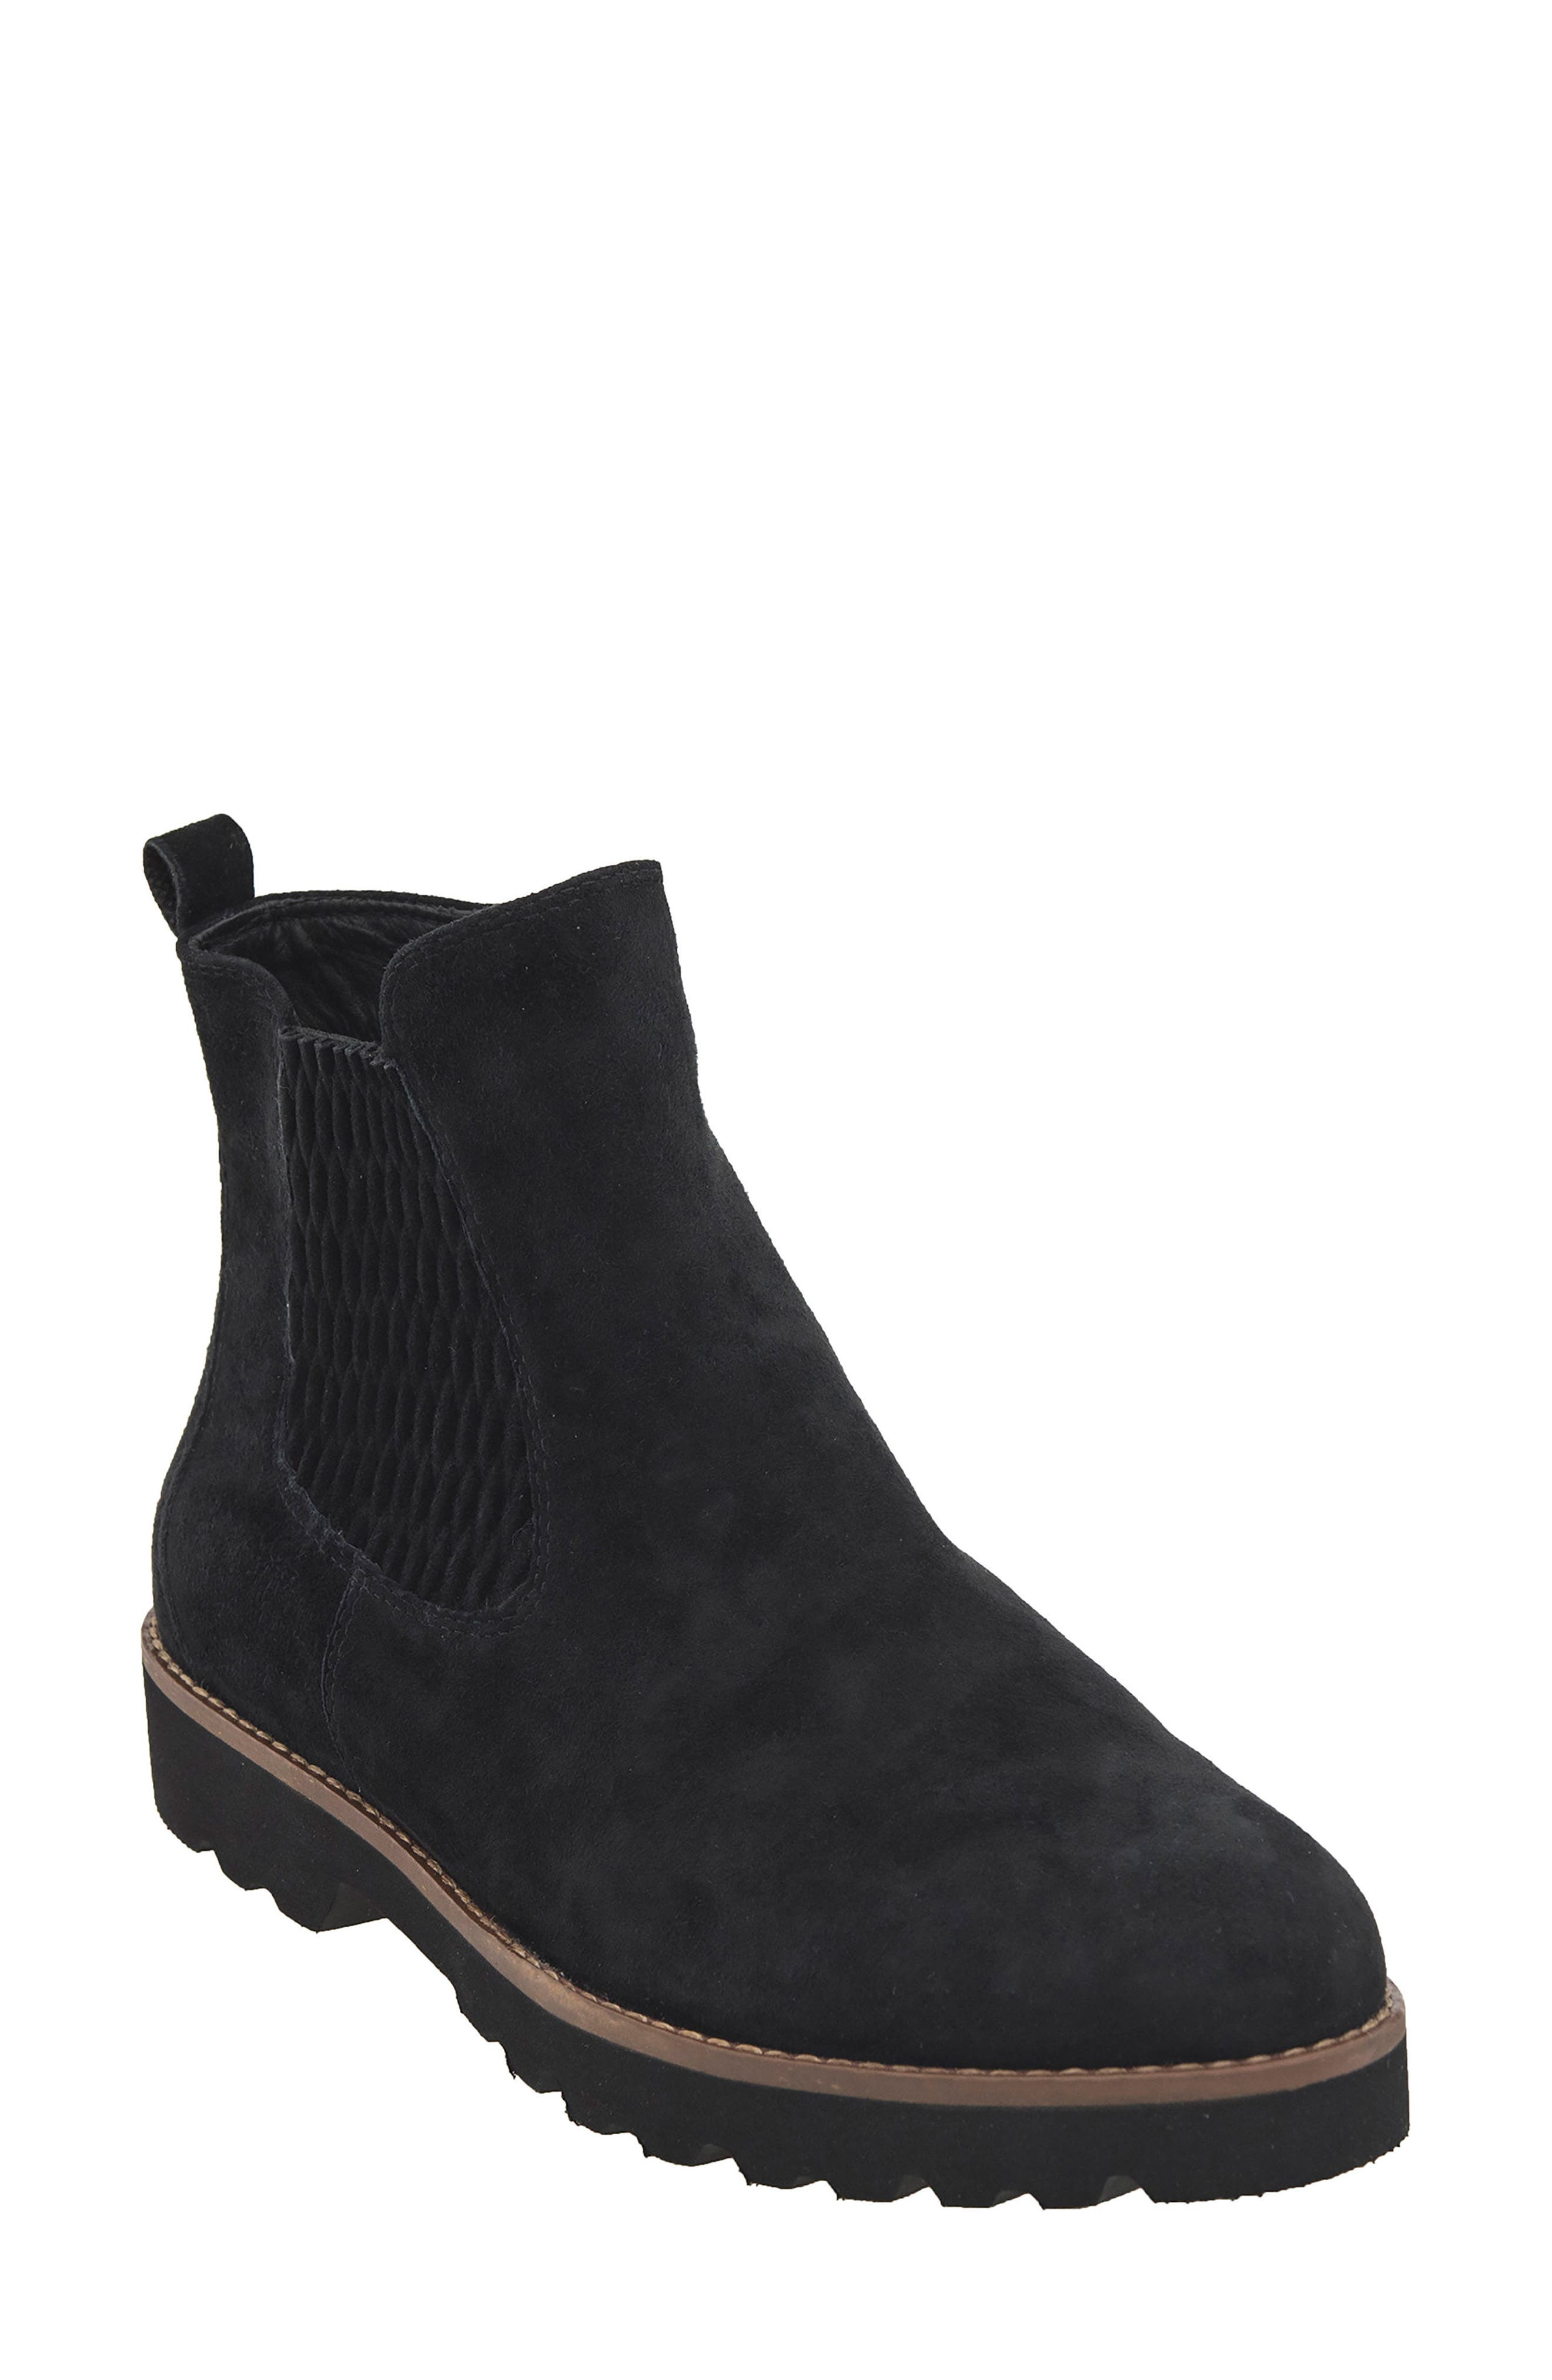 Main Image - Earthies® Madrid Chelsea Boot (Women)